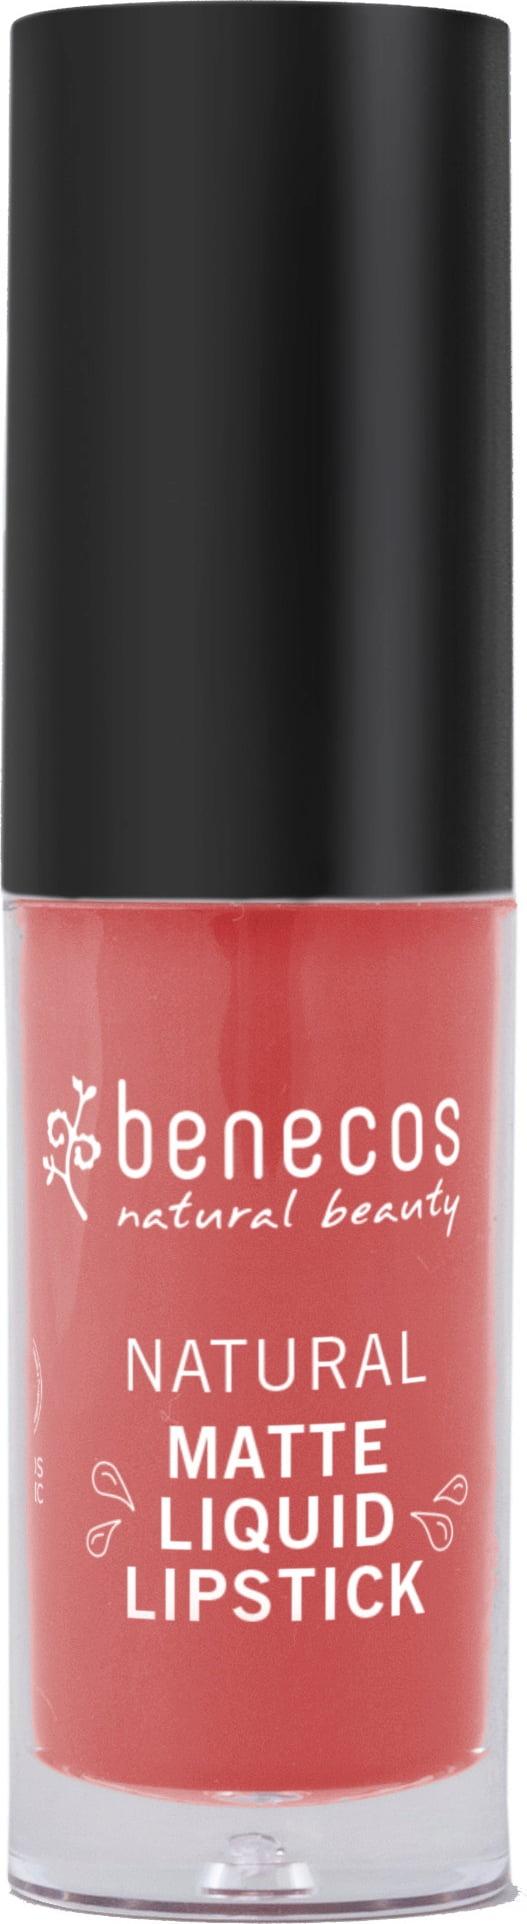 Benecos Natural Matte Liquid Lipstick Coral Kiss 5ml